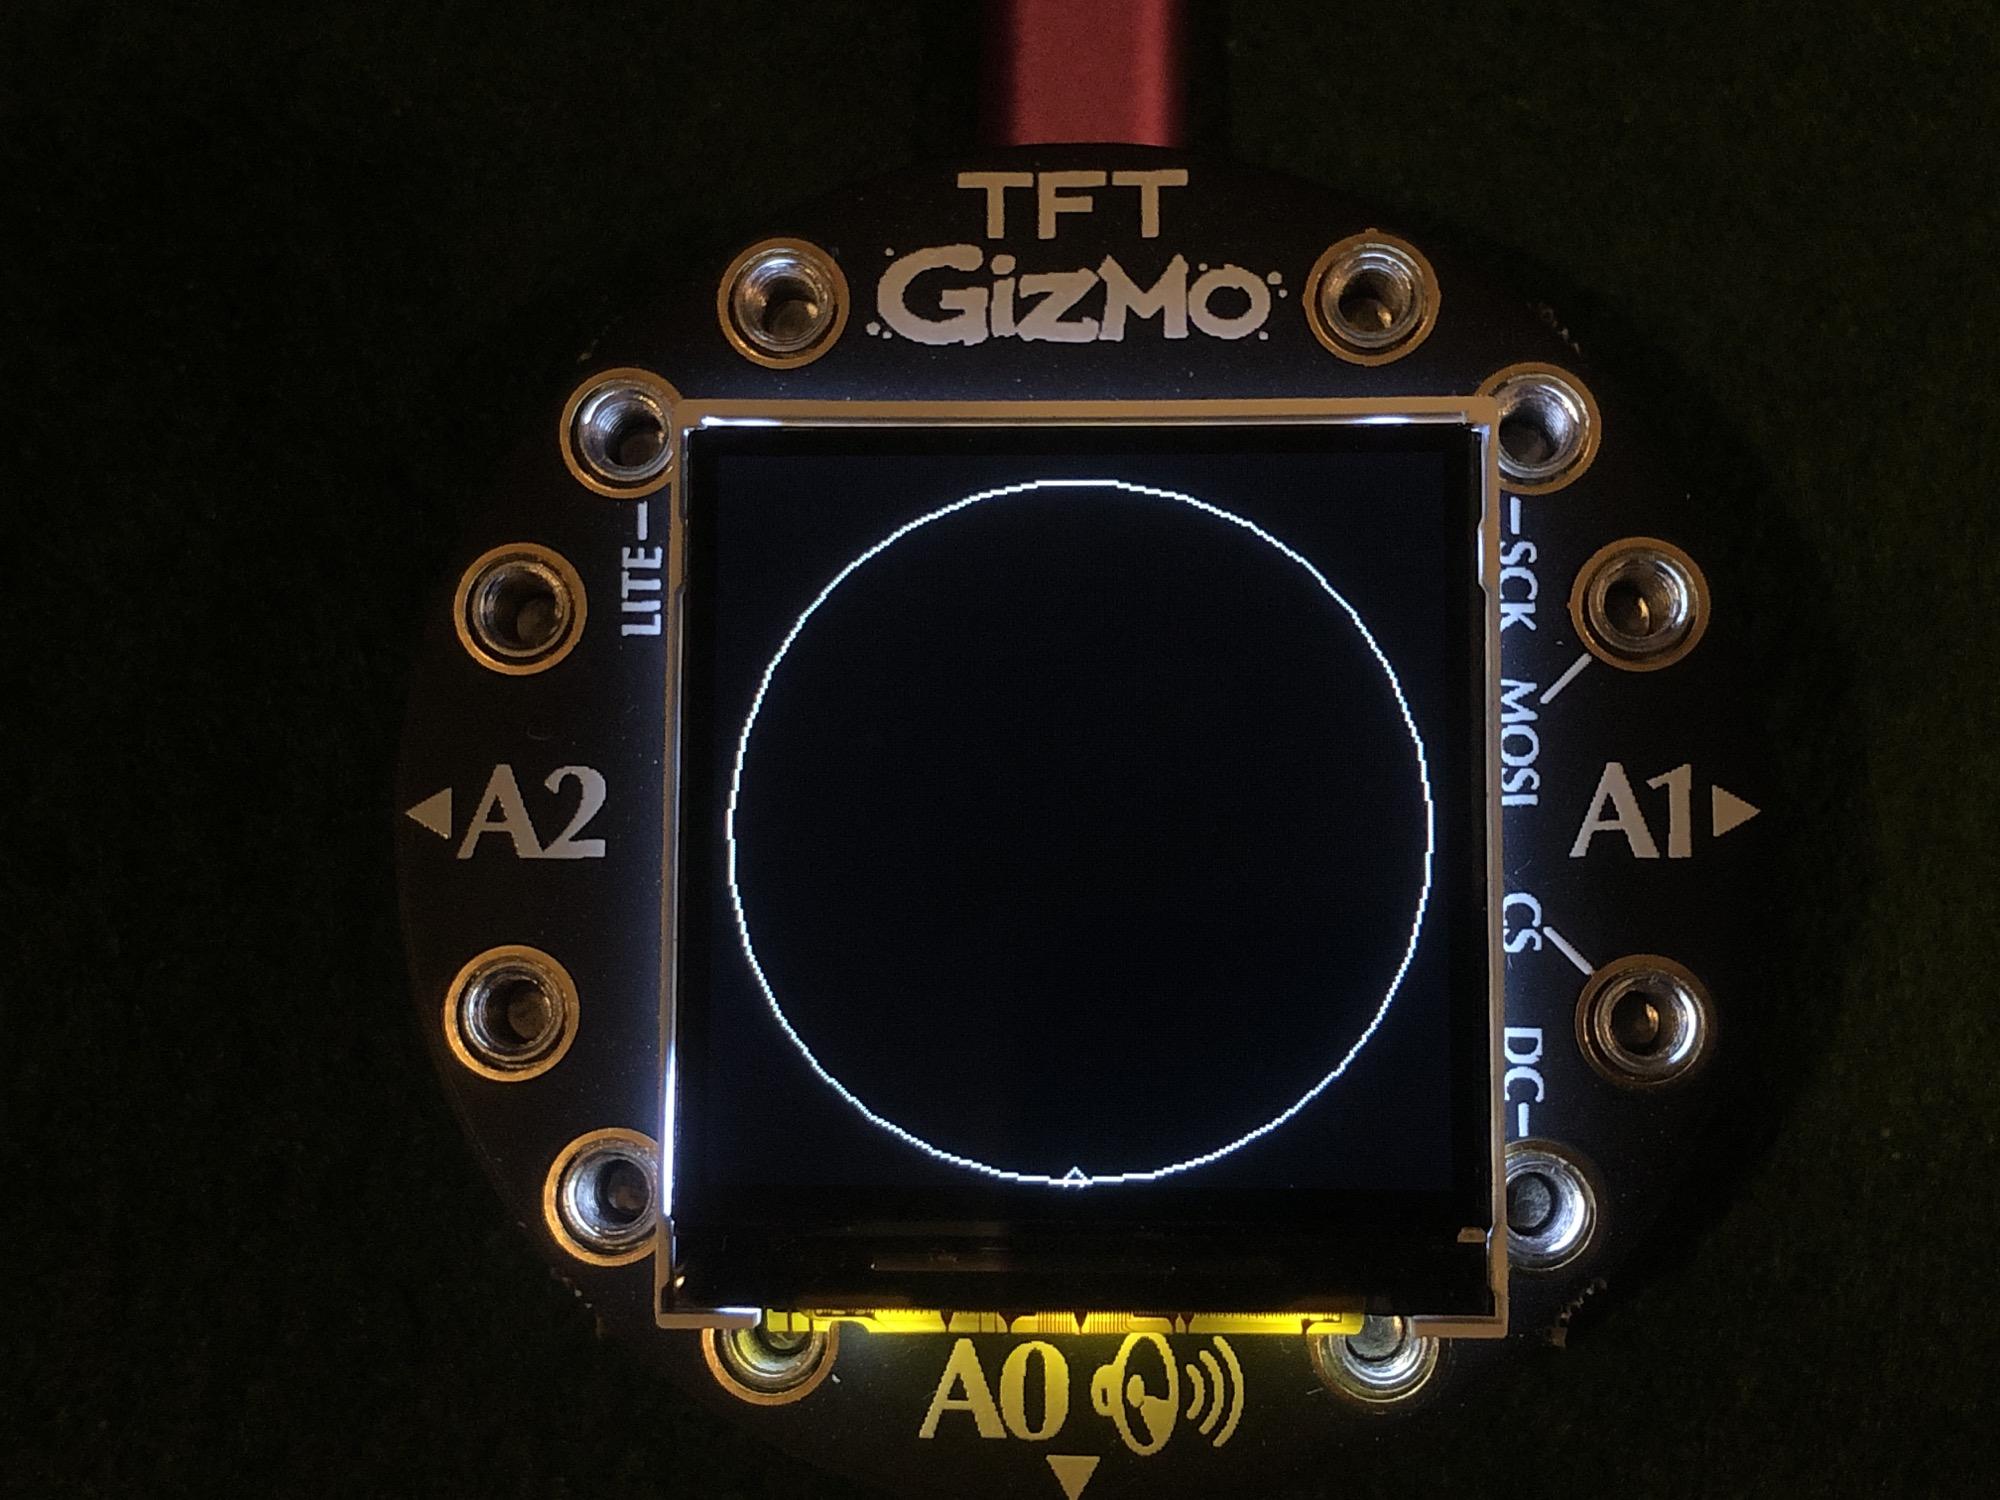 circuitpython_turtle_gizmo_9173.jpg